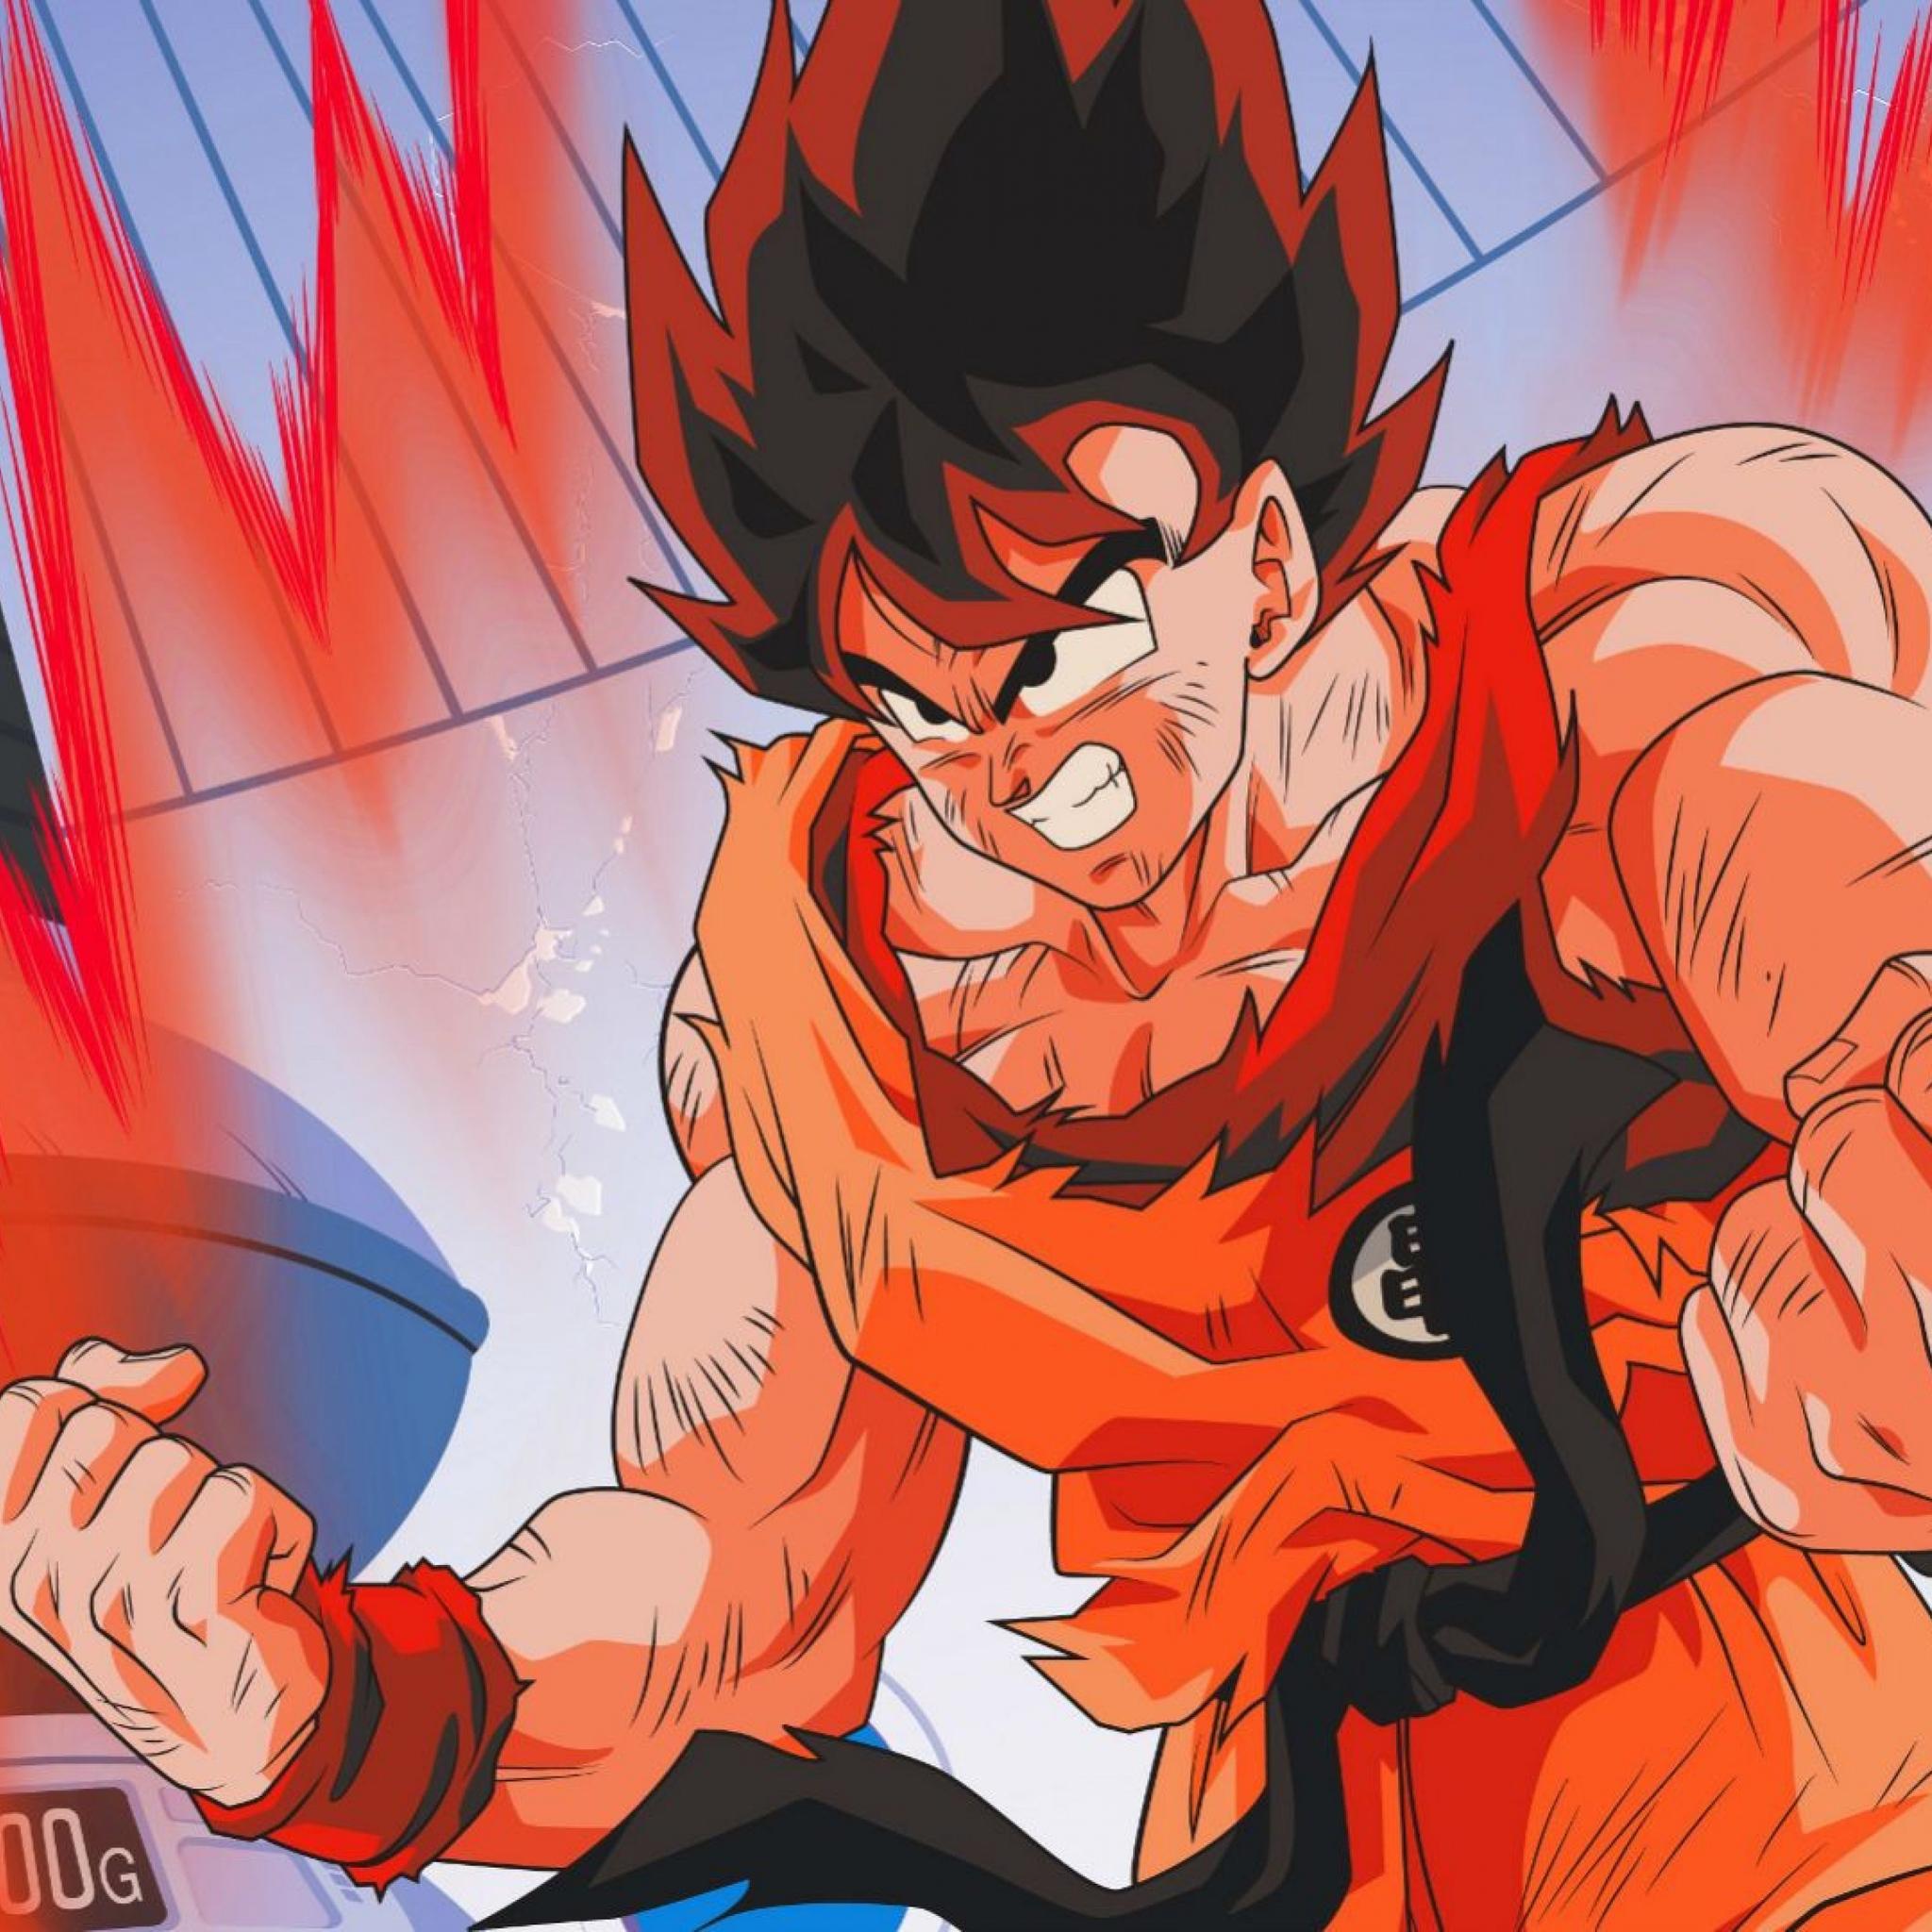 2048x2048 Goku Dragon Ball Z 4k Ipad Air Hd 4k Wallpapers